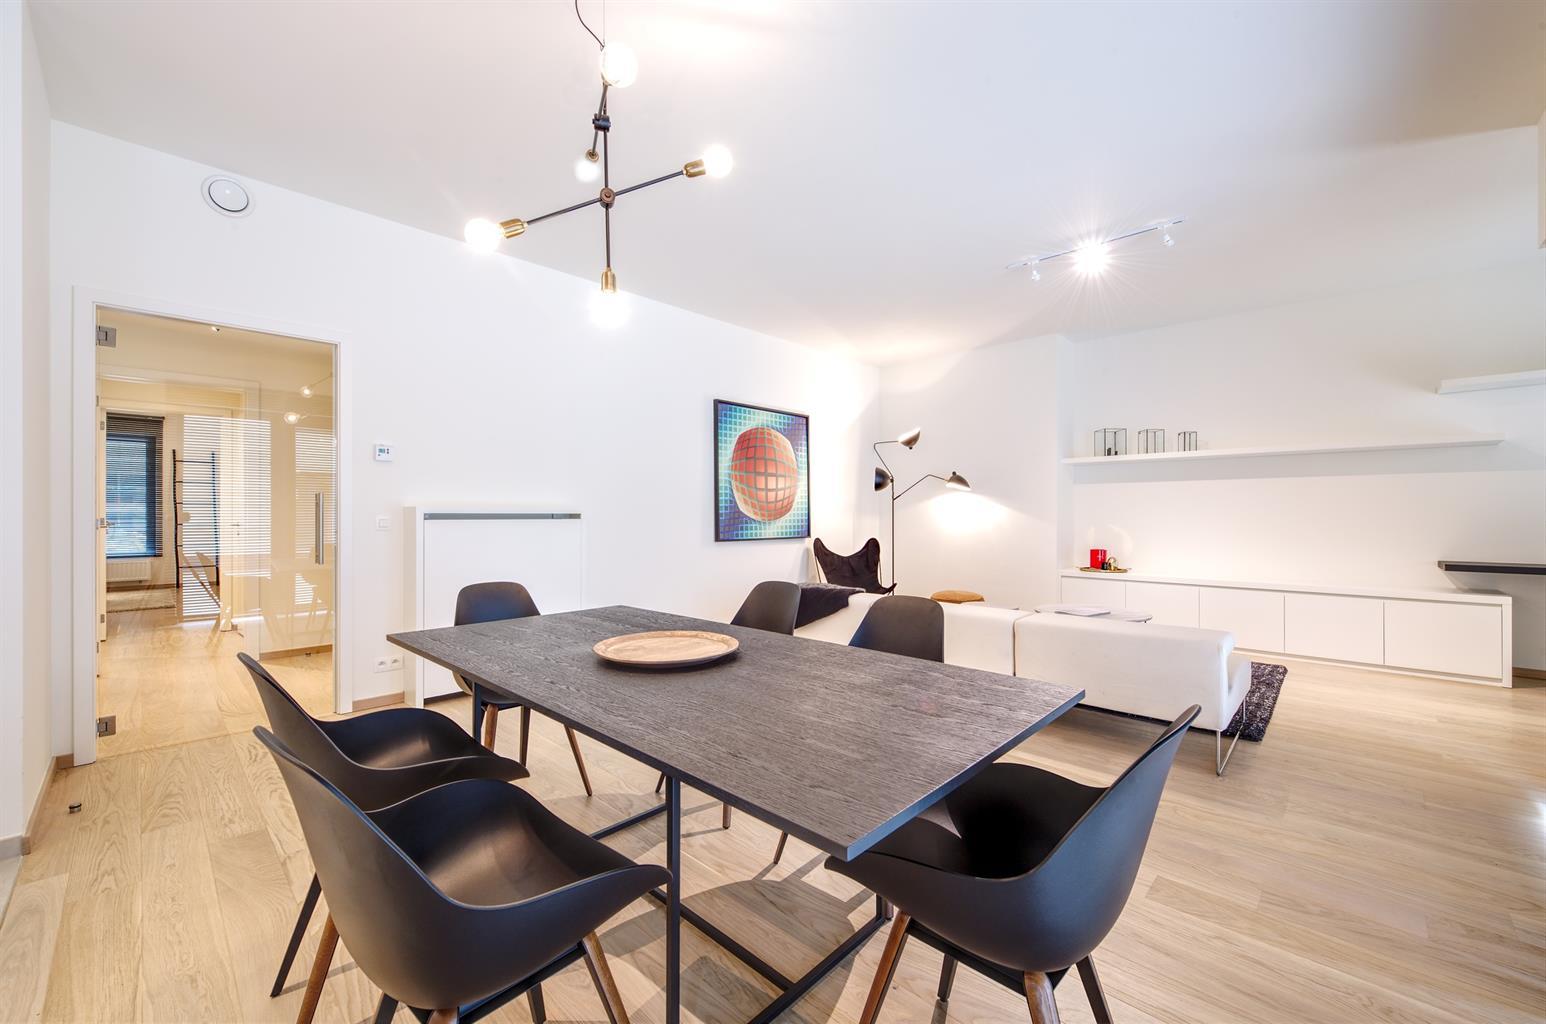 Appartement - Rixensart - #4143534-5